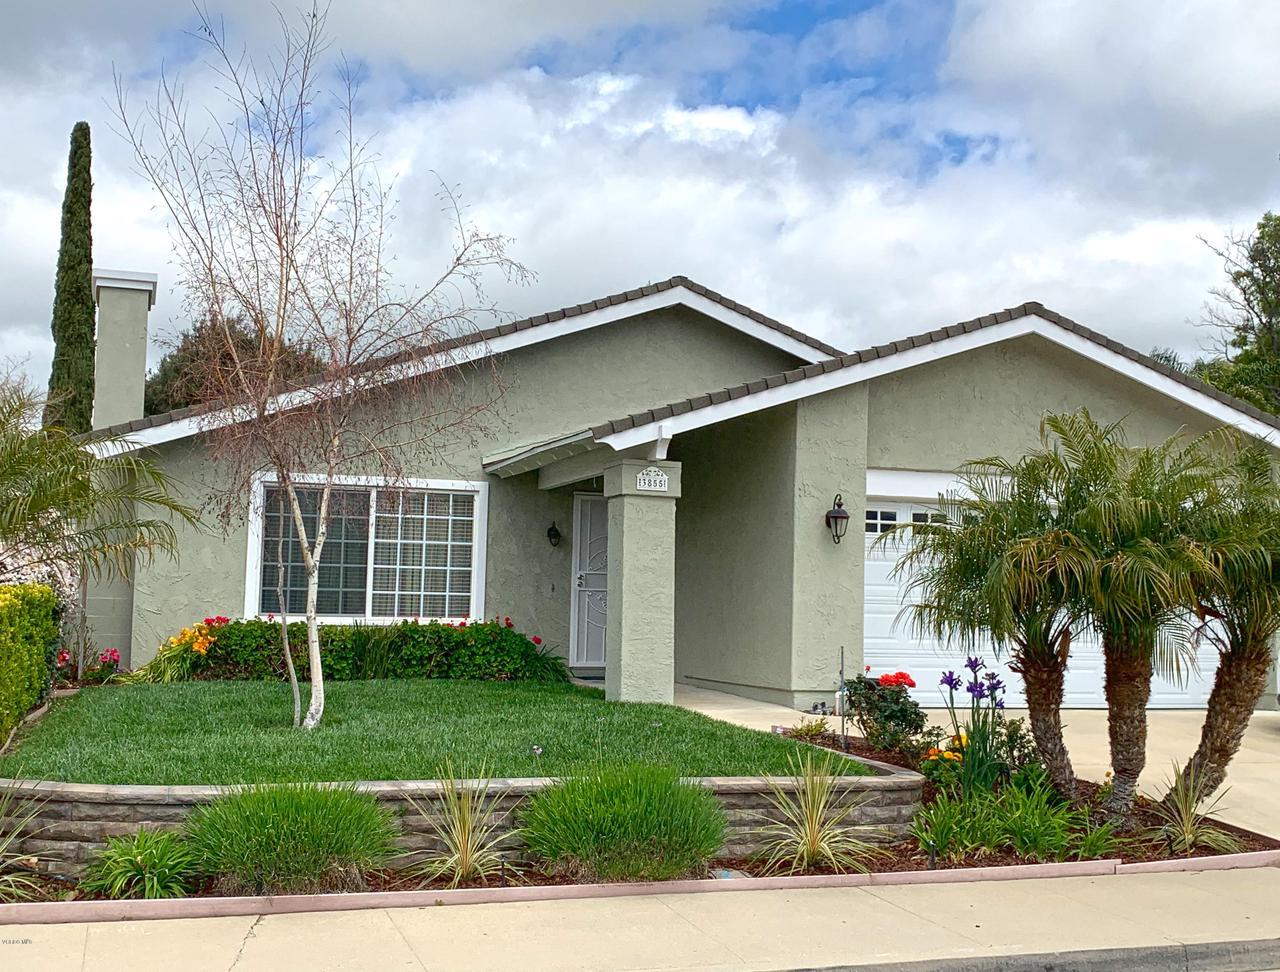 3855 DIXON, Simi Valley, CA 93063 - Front (12)